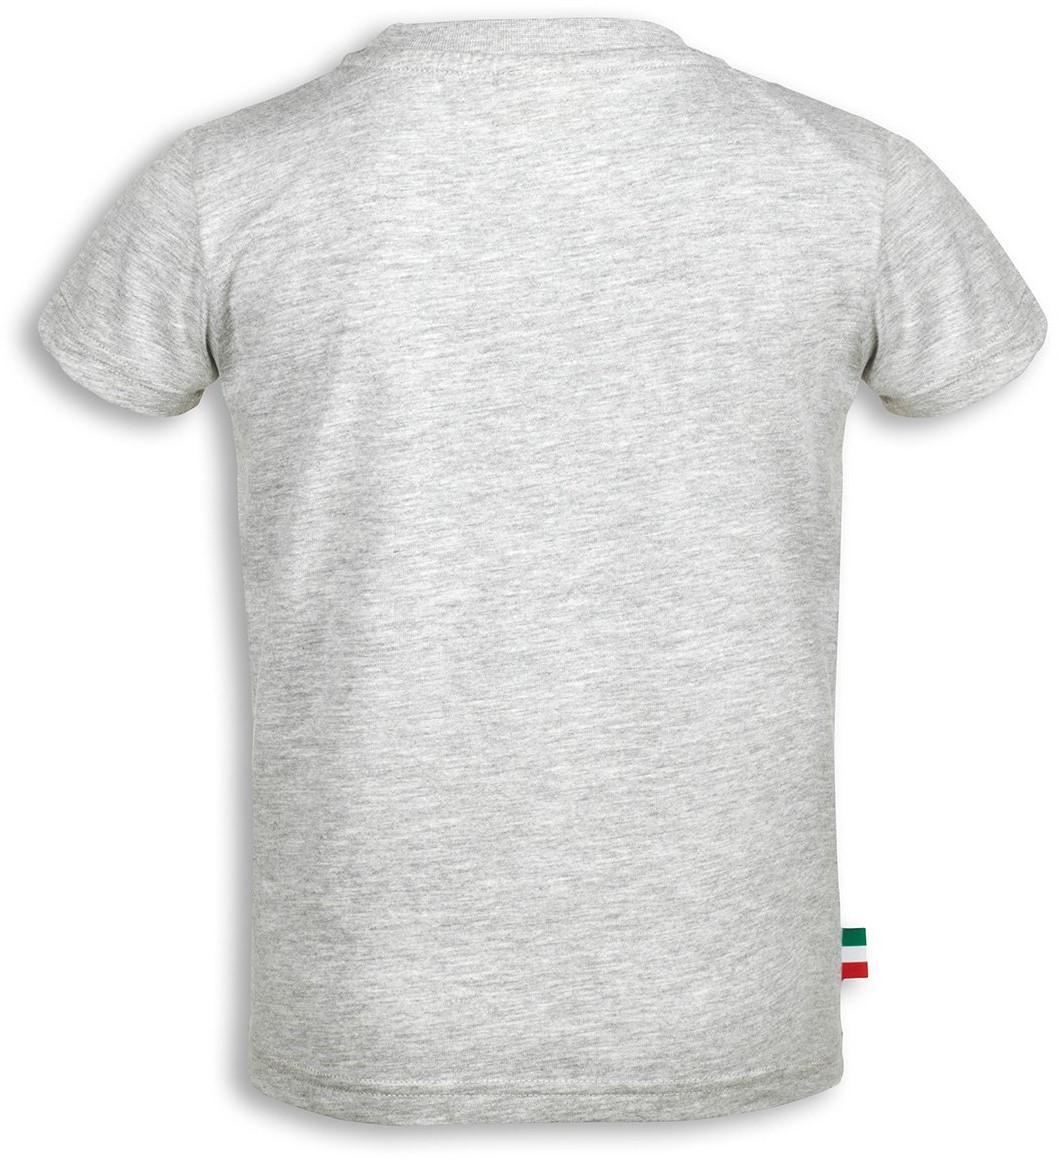 【DUCATI performance】80s 兒童 T恤 - 「Webike-摩托百貨」